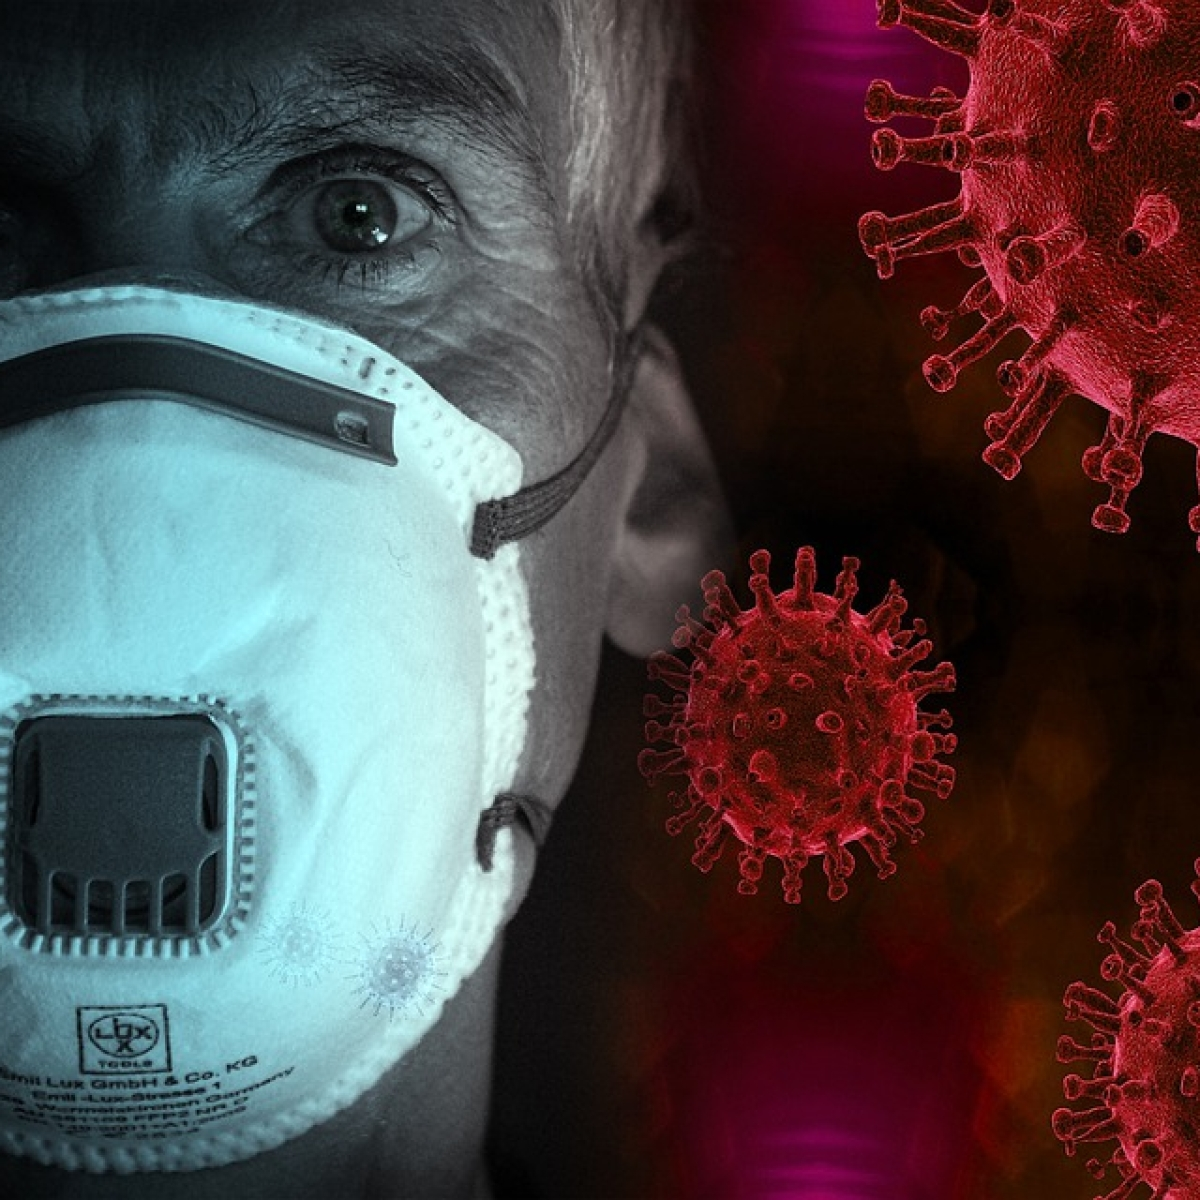 Coronavirus Outbreak: Poor ventilation can increase risk of coronavirus spread, says study